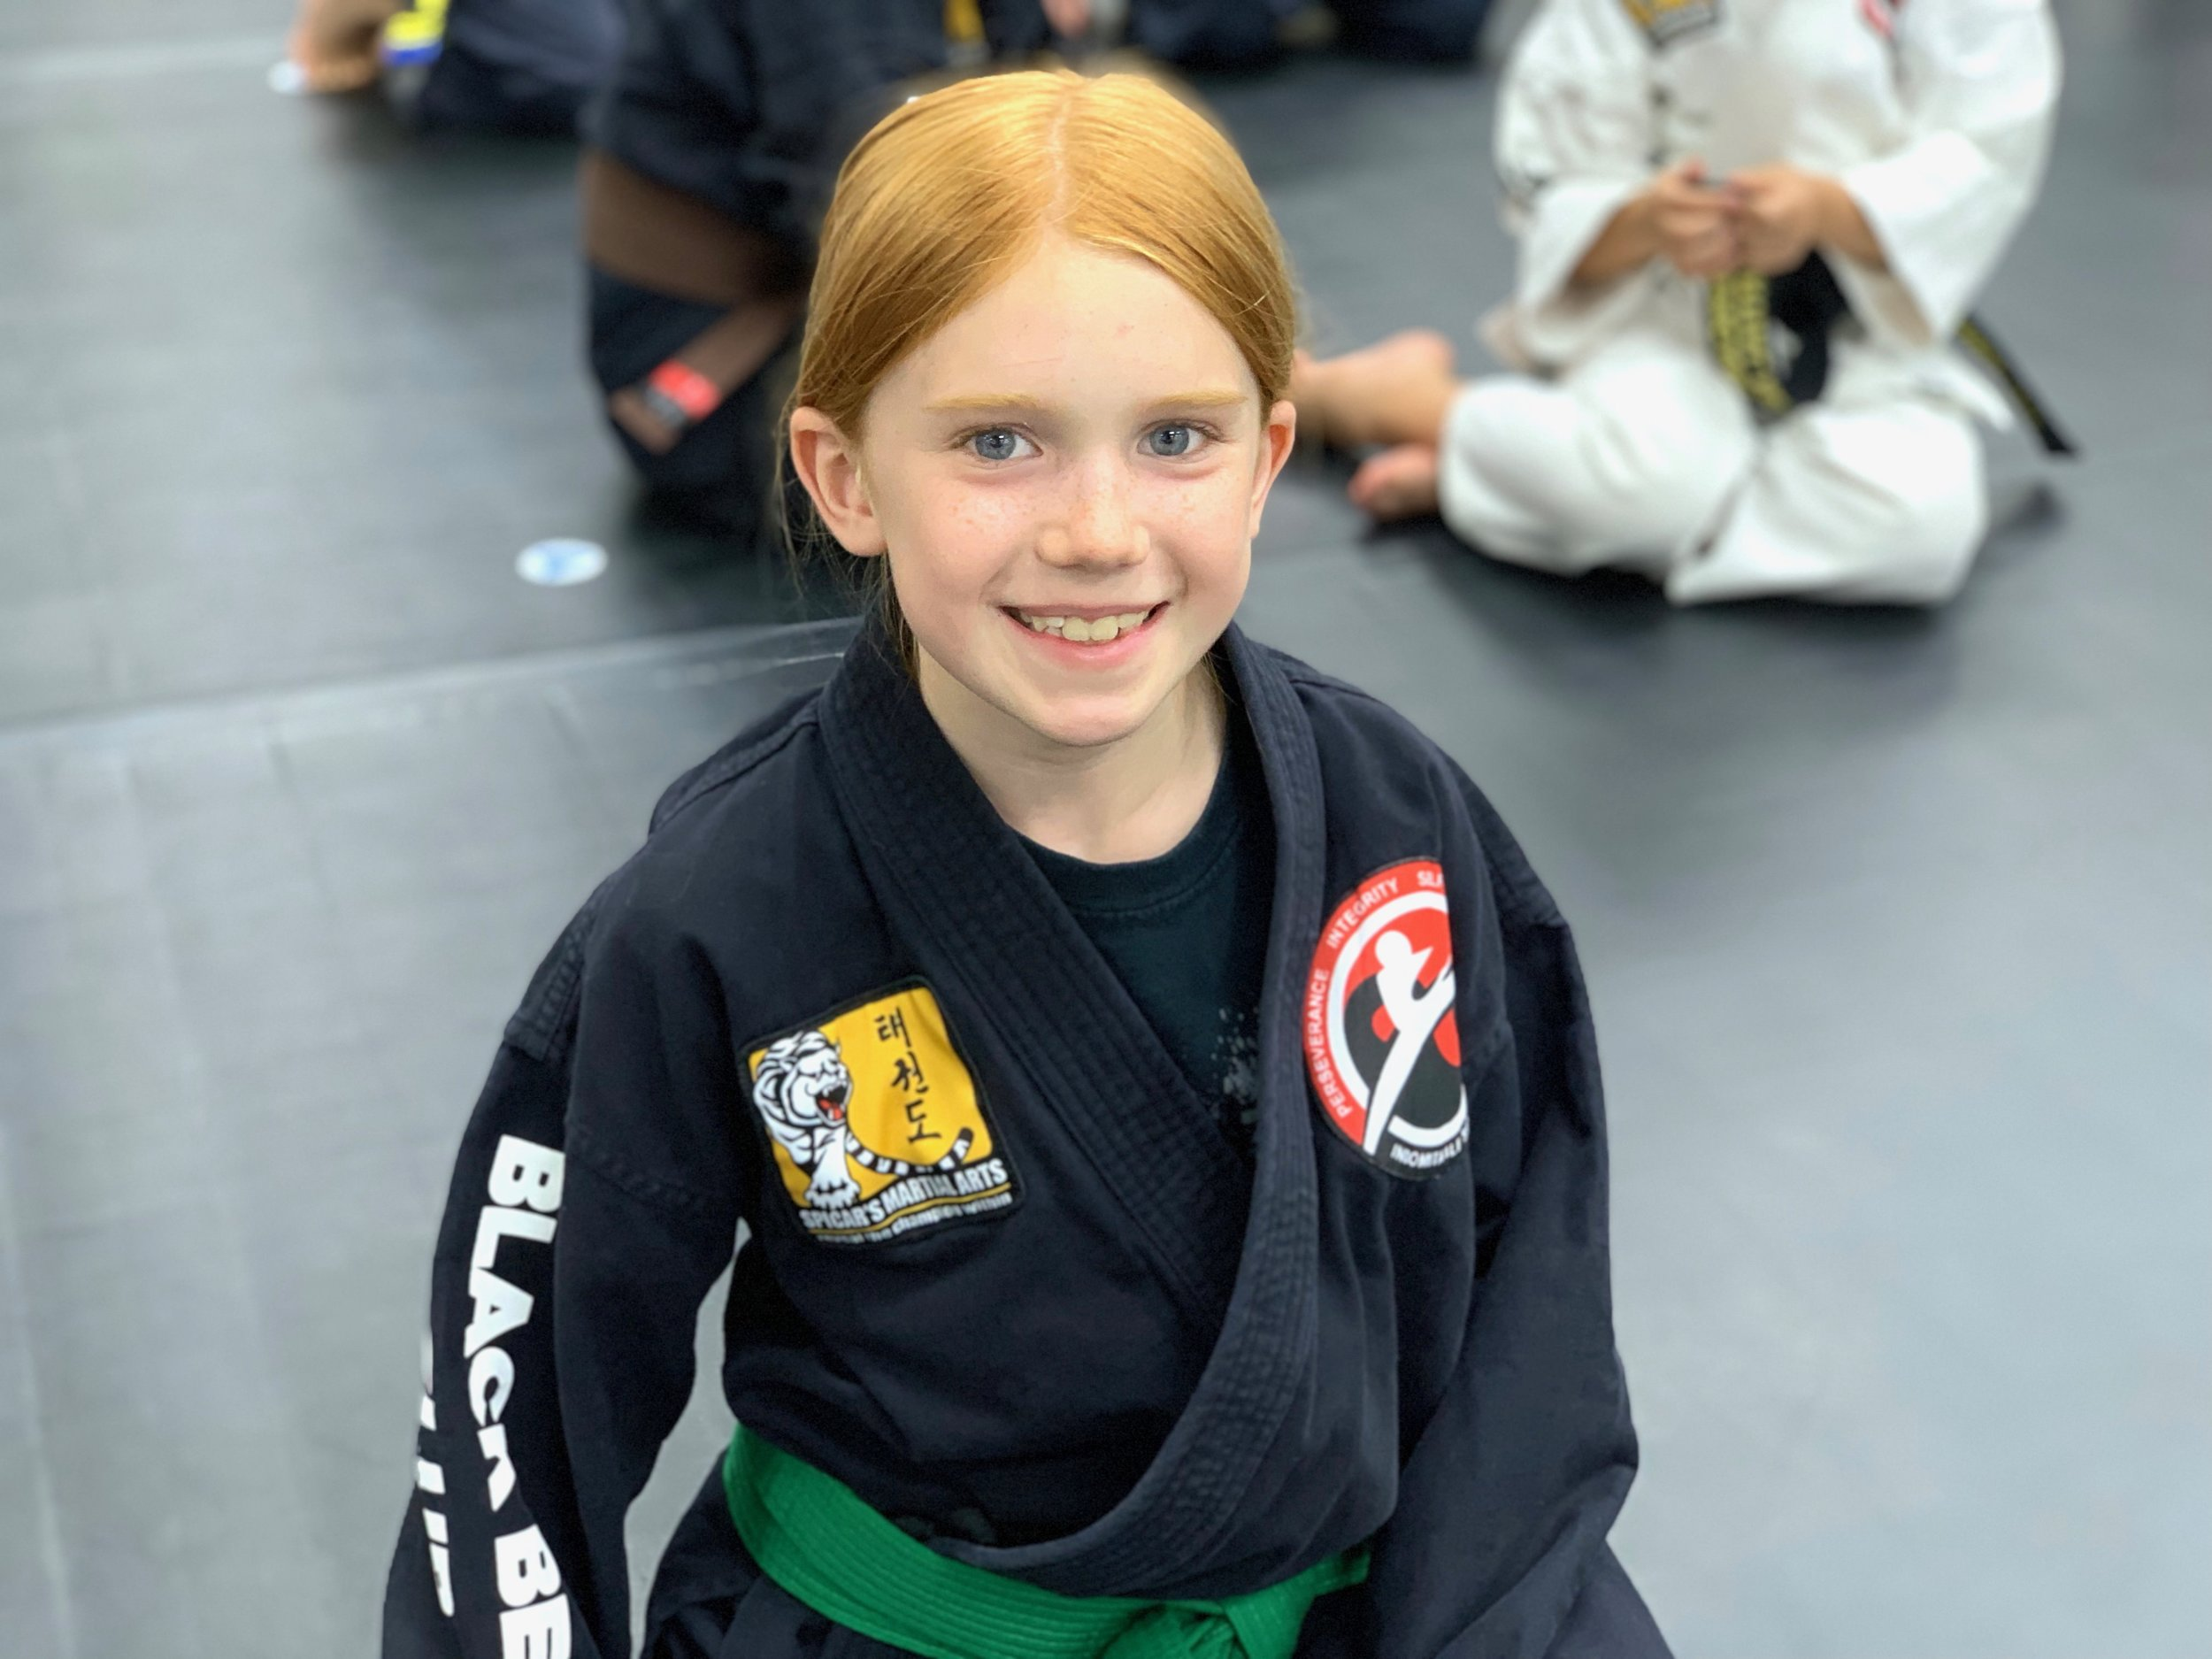 karate-kids-program-souhtlake-keller-grapevine-texas00033.jpeg